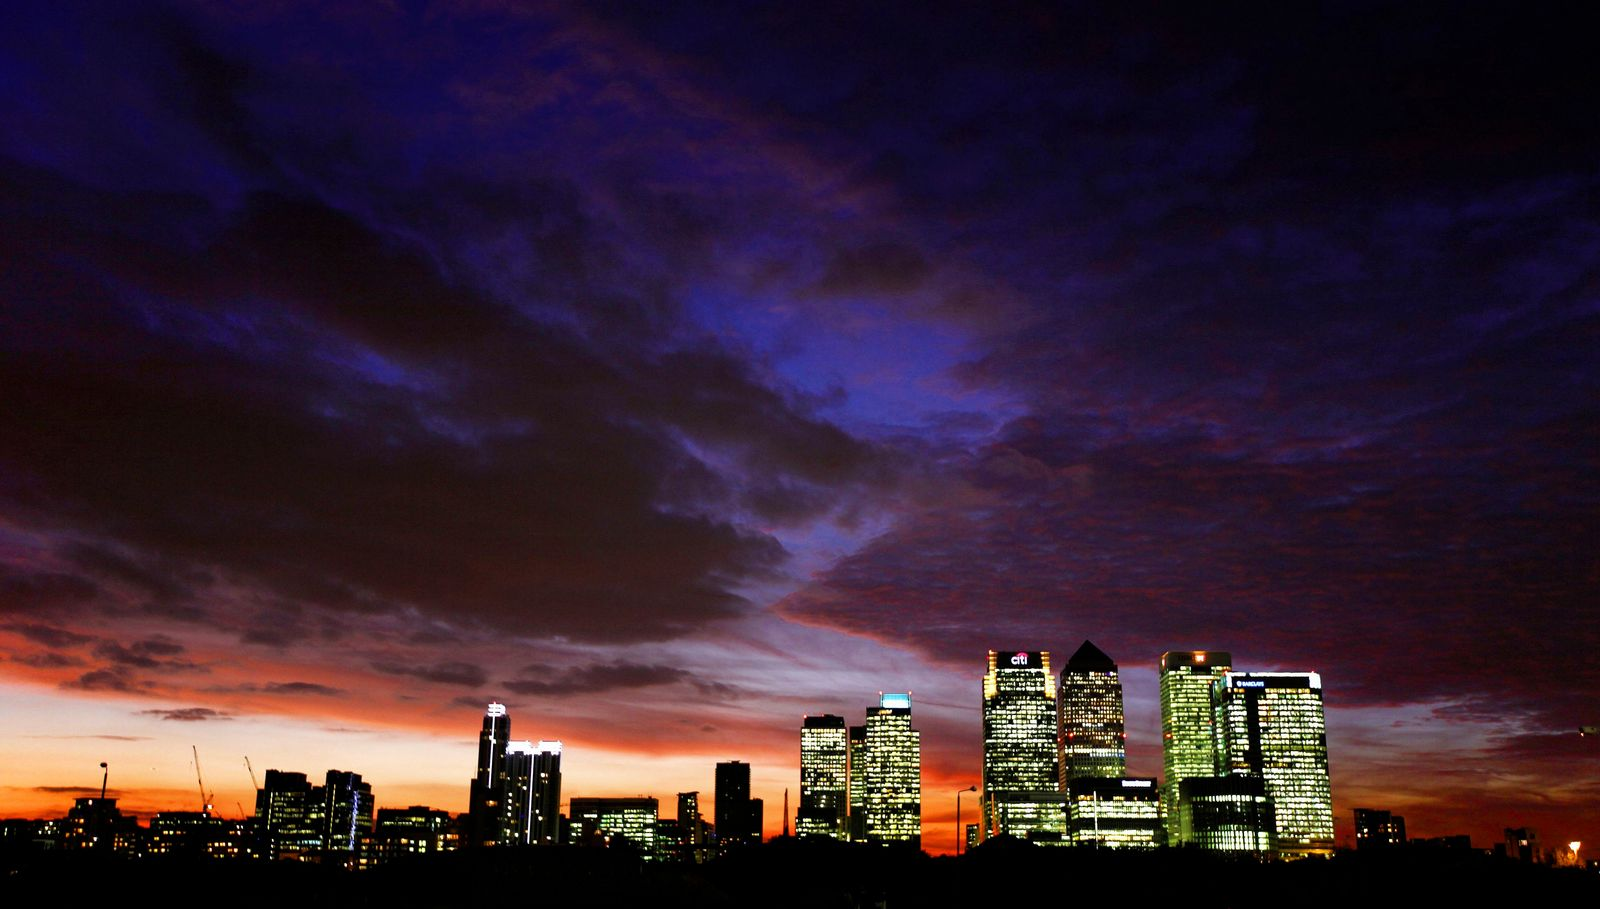 London / Skyline / Canary Wharf